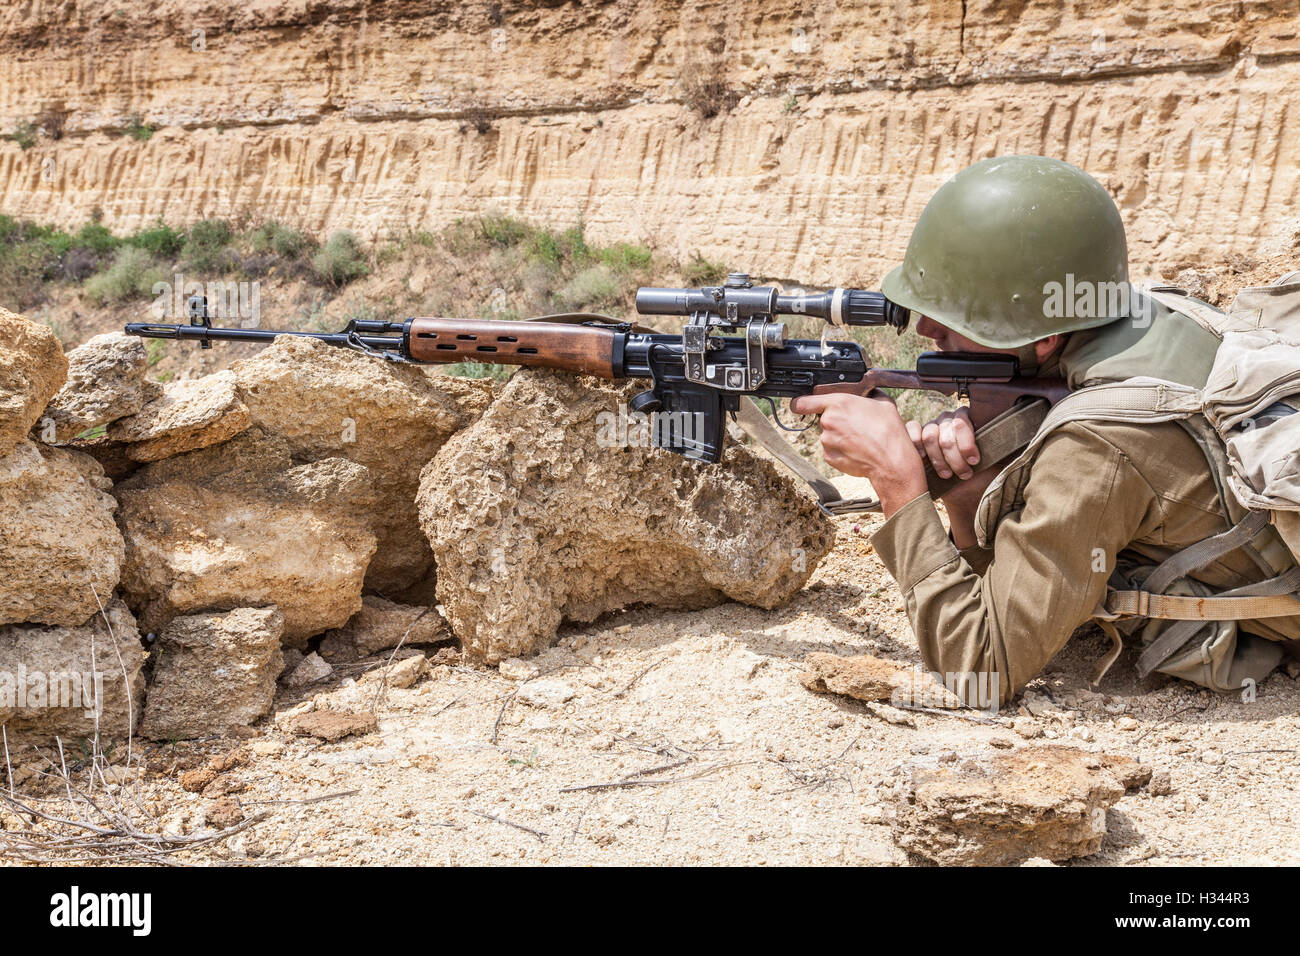 Soviet Afghanistan war - Page 6 Soviet-paratrooper-in-afghanistan-H344R3